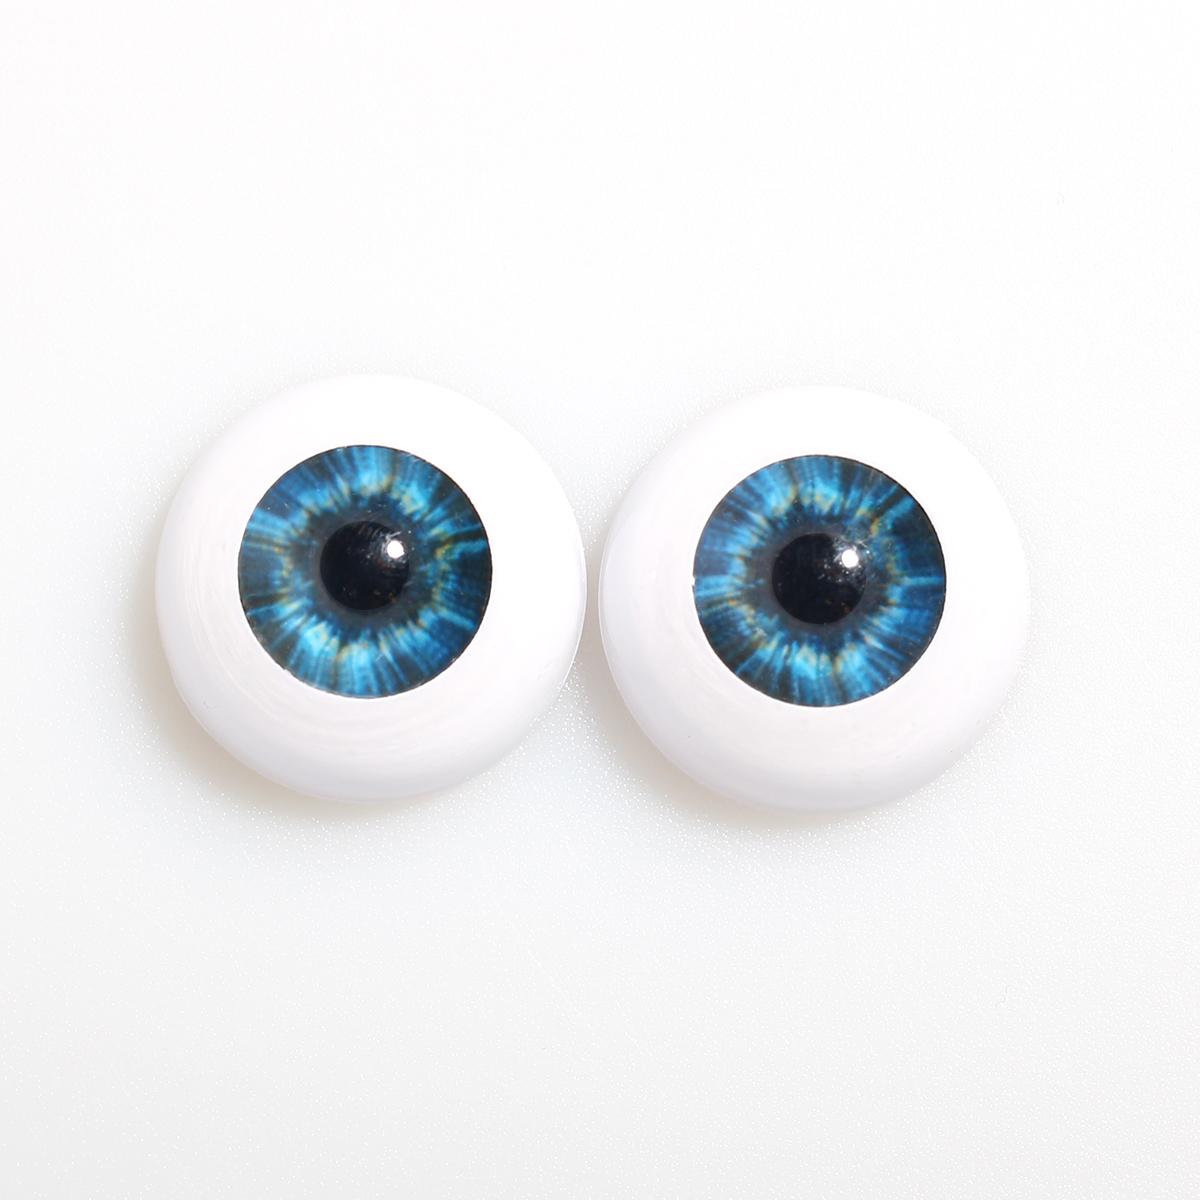 5 Pairs Acrylic Doll Eyeballs Eyes Newborn Baby Doll BJD DIY Crafts 20mm